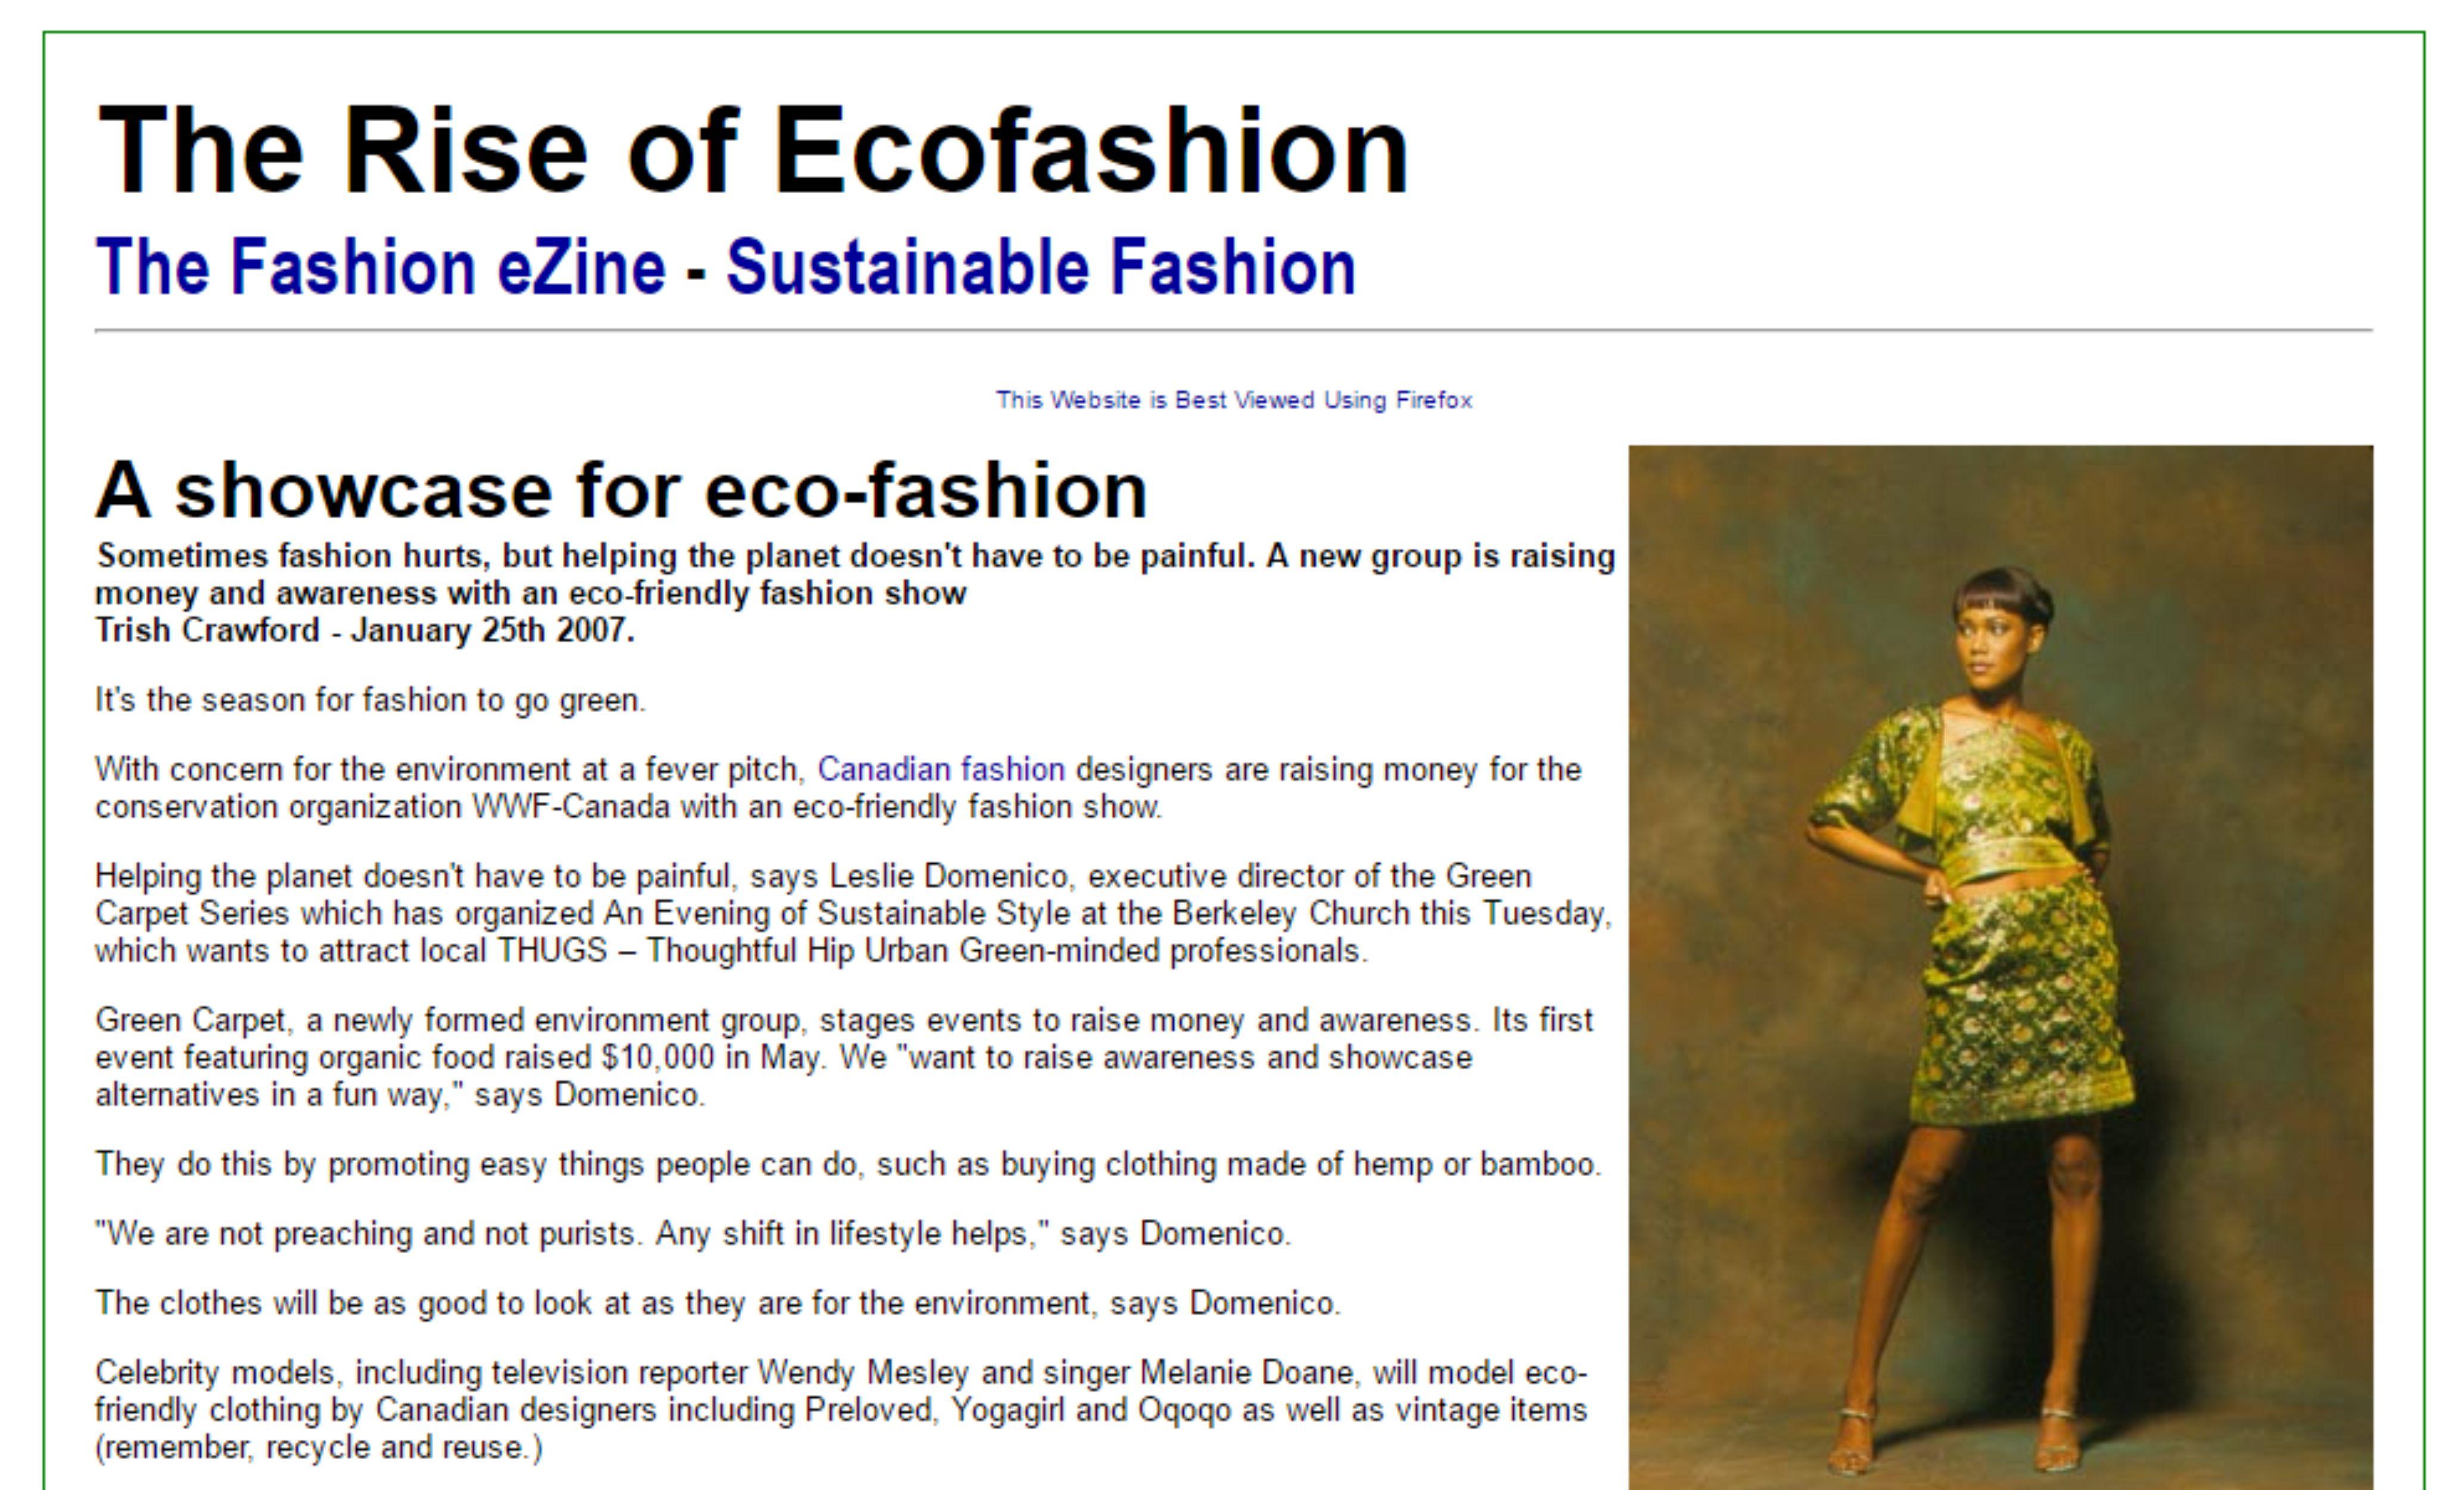 fashion.lilithezine.com link